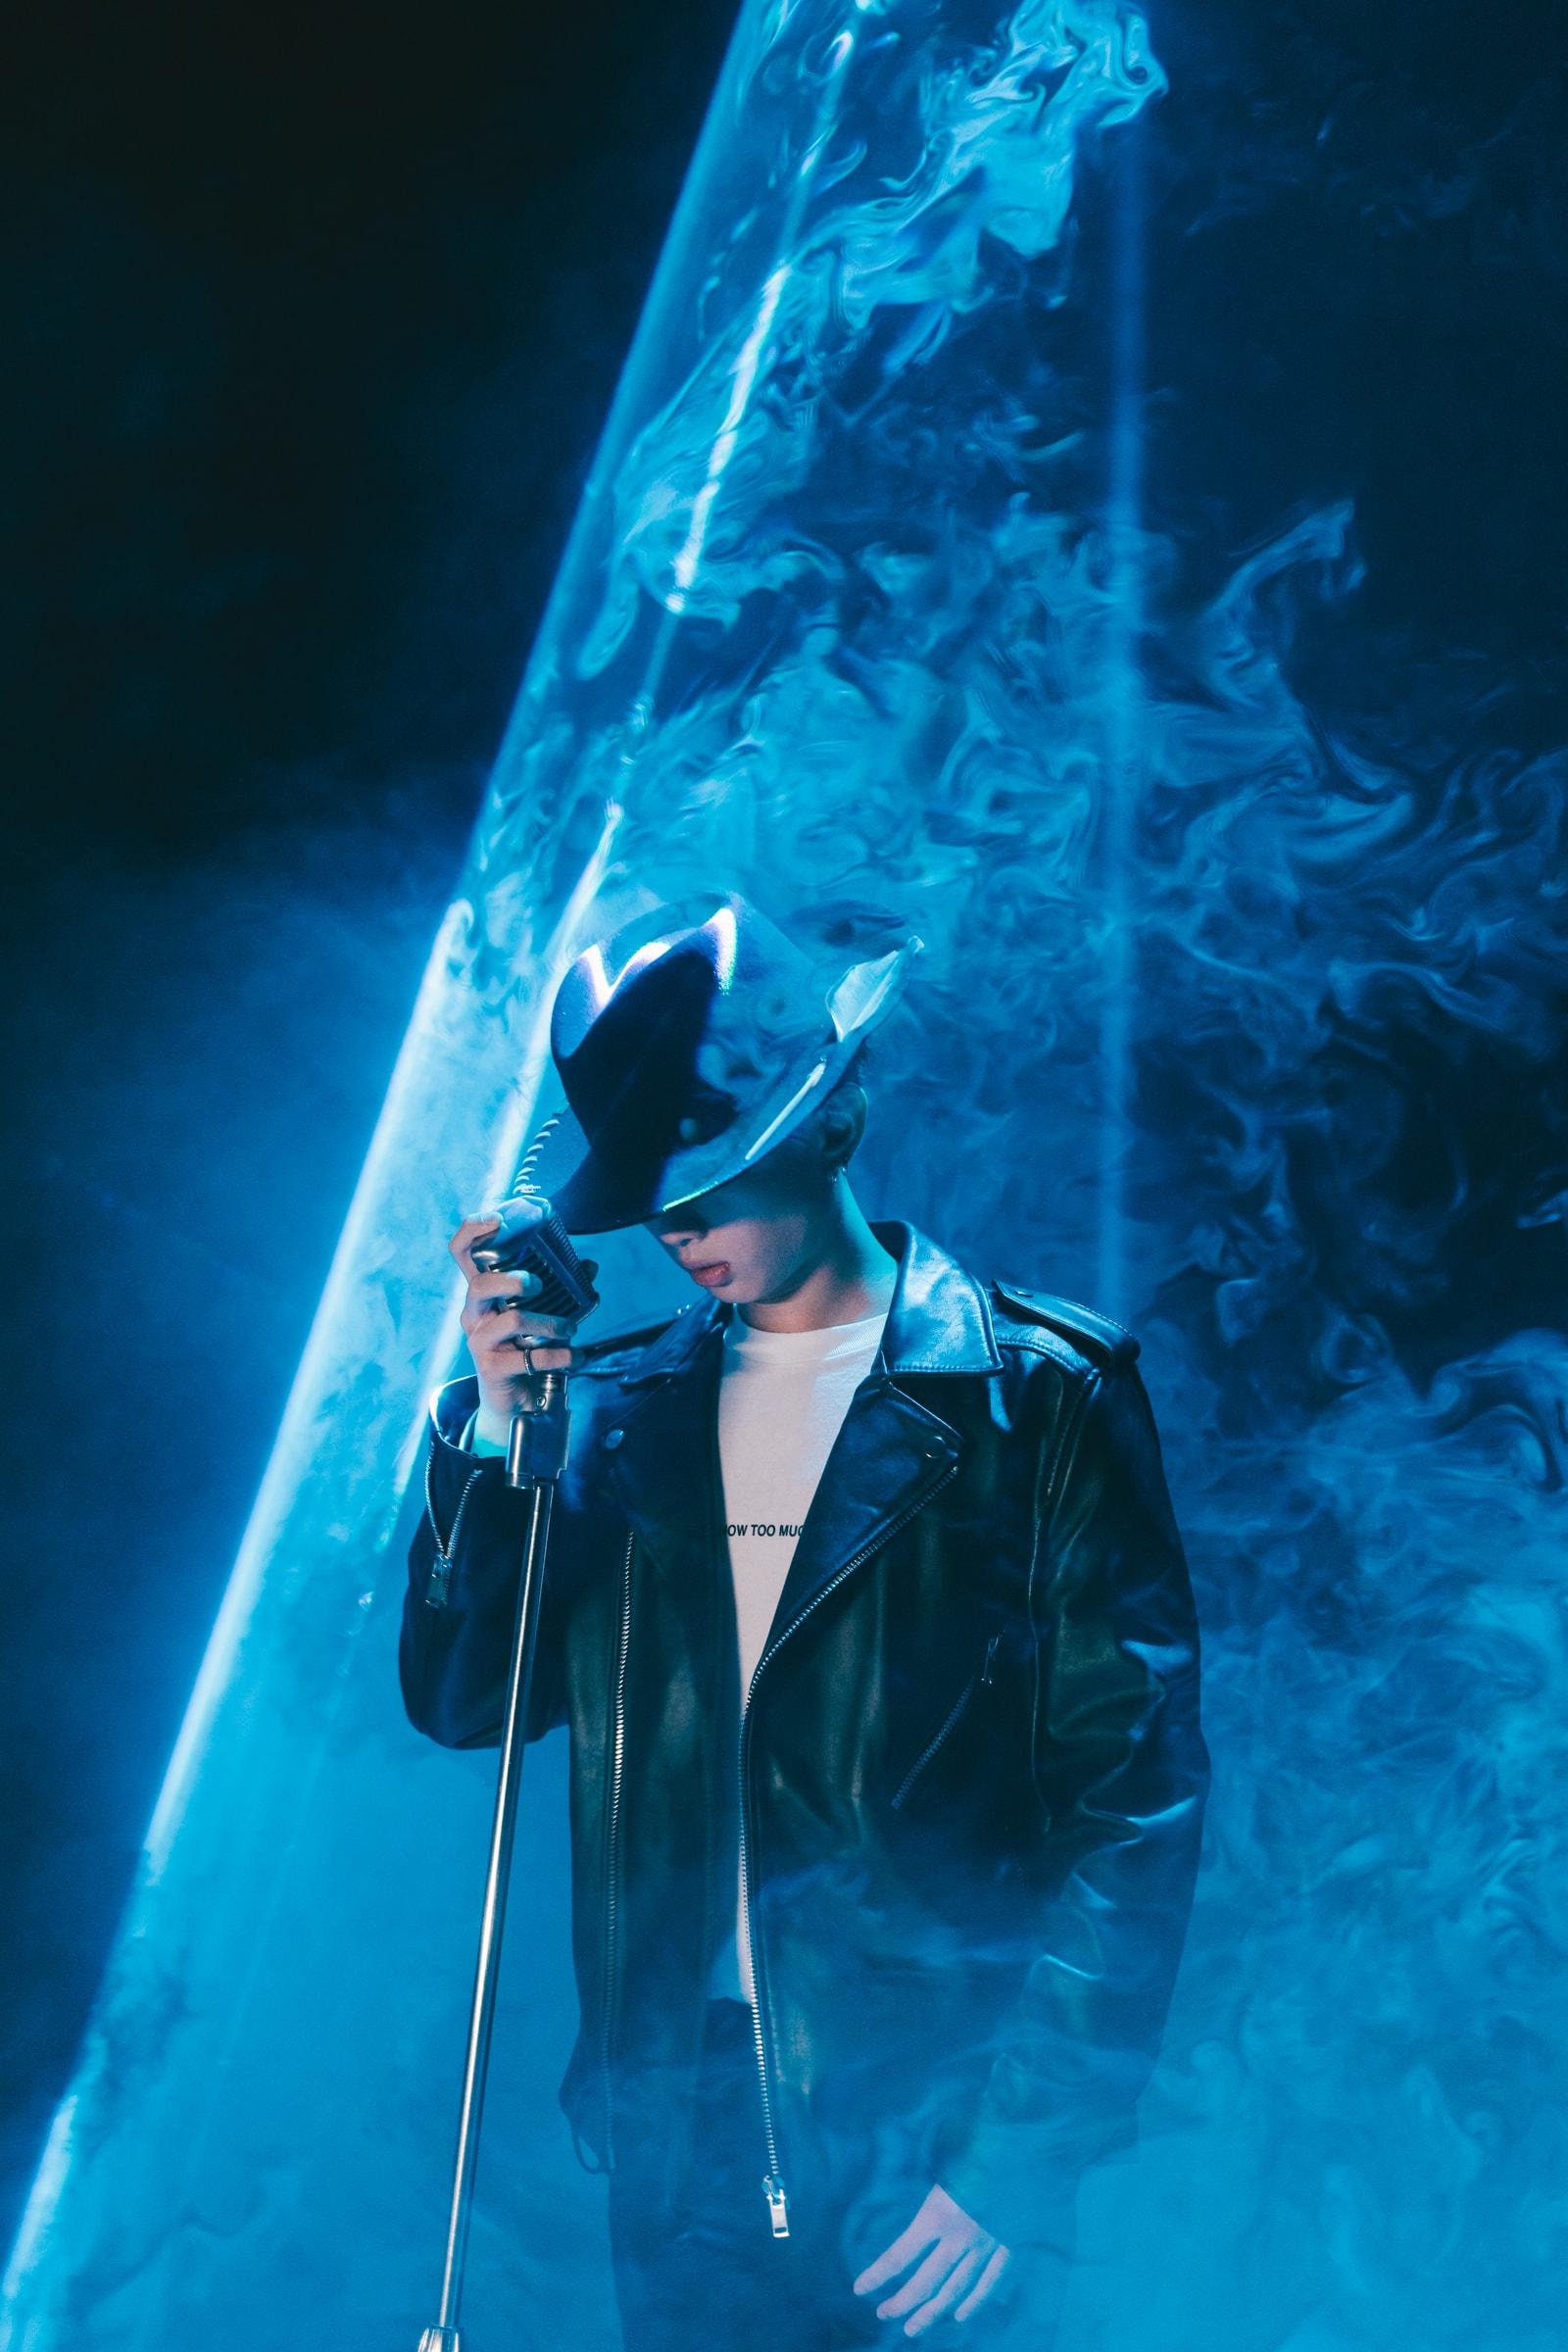 Tyson Yoshi 單曲《I DON'T GIVE A Part II》全新音樂錄影帶正式發佈